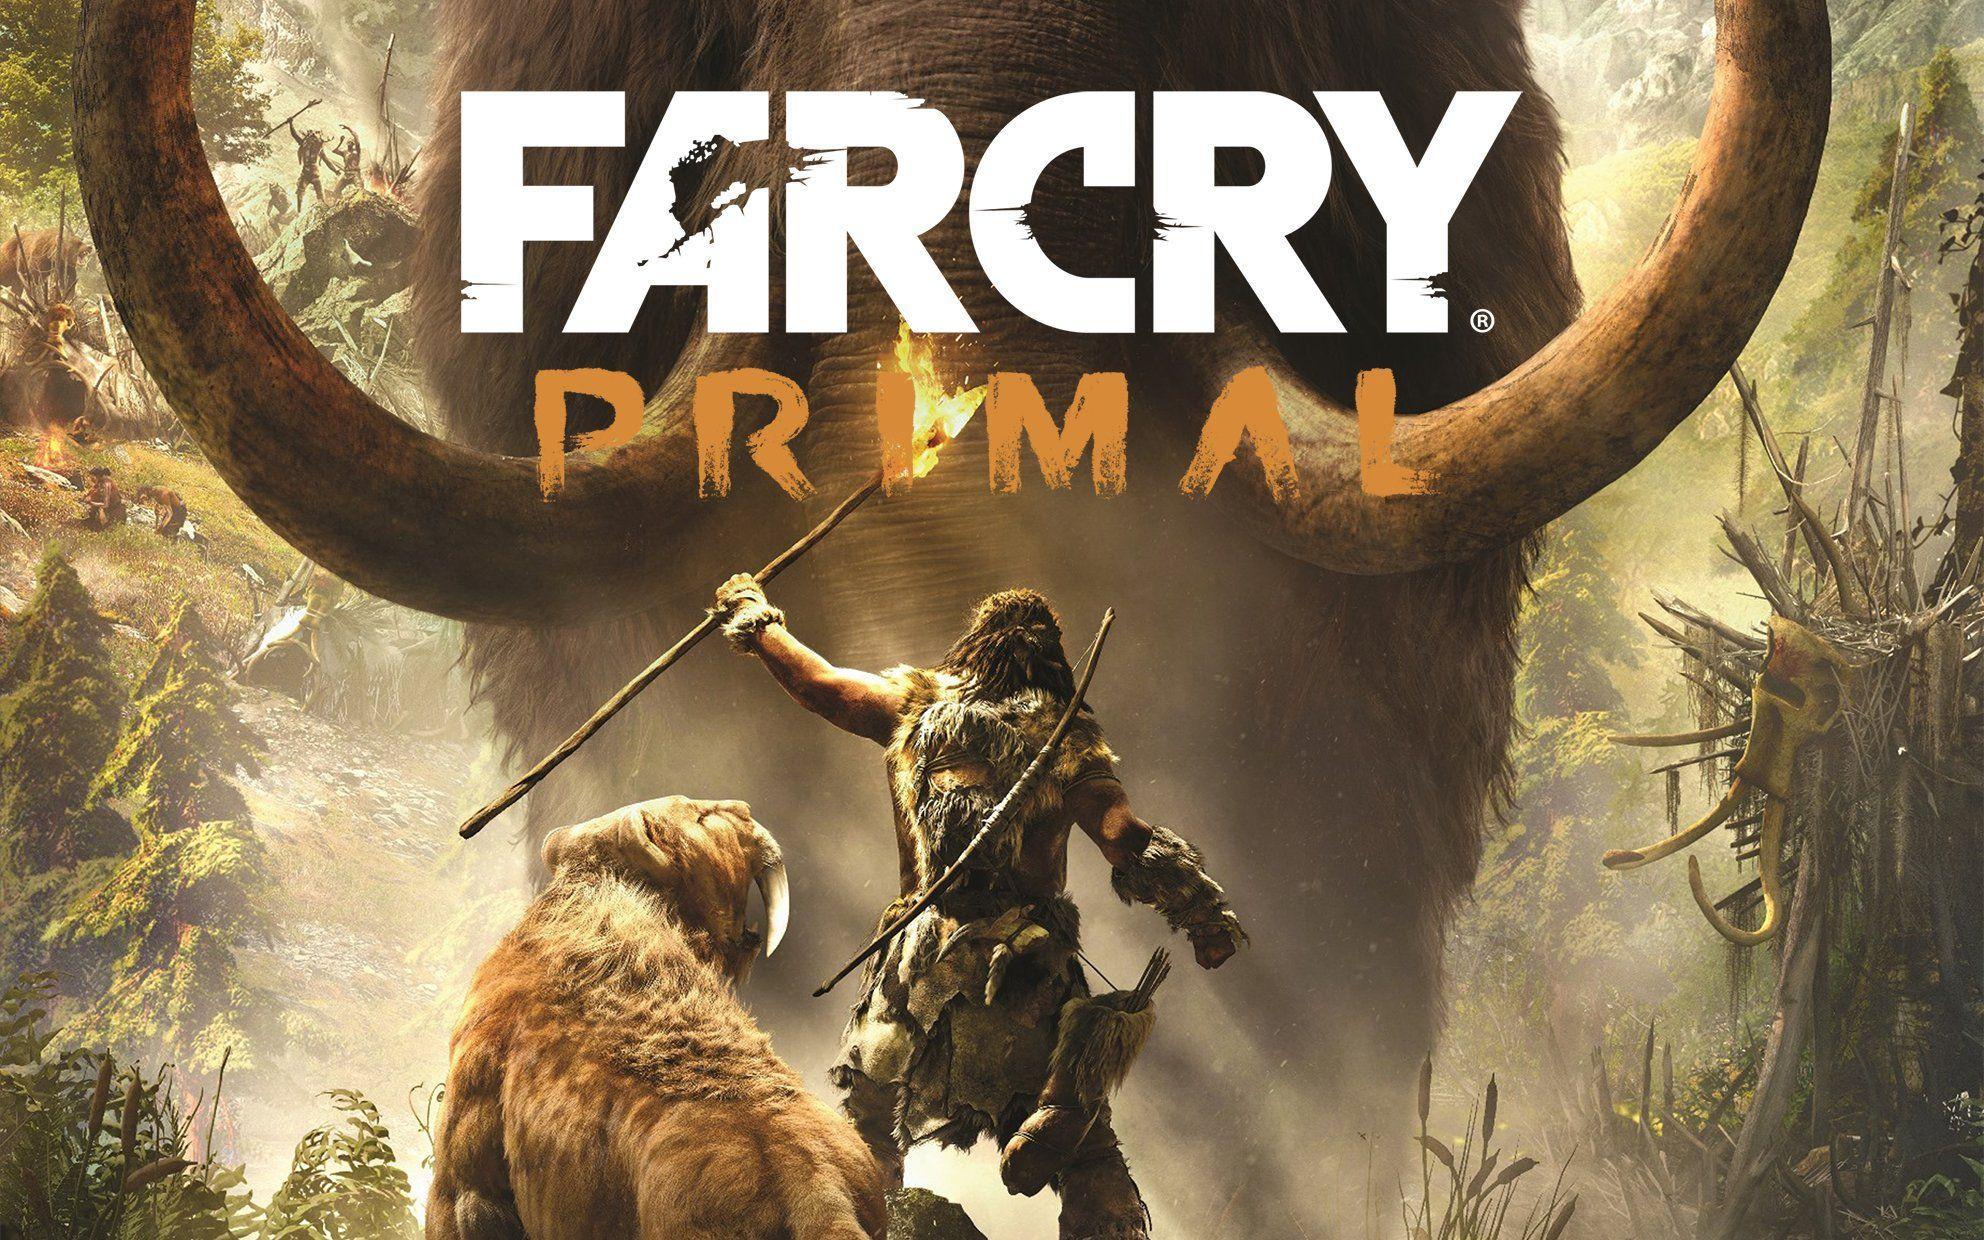 Far Cry Primal Artwork Video Games Wallpapers Hd: Far Cry Primal Wallpapers